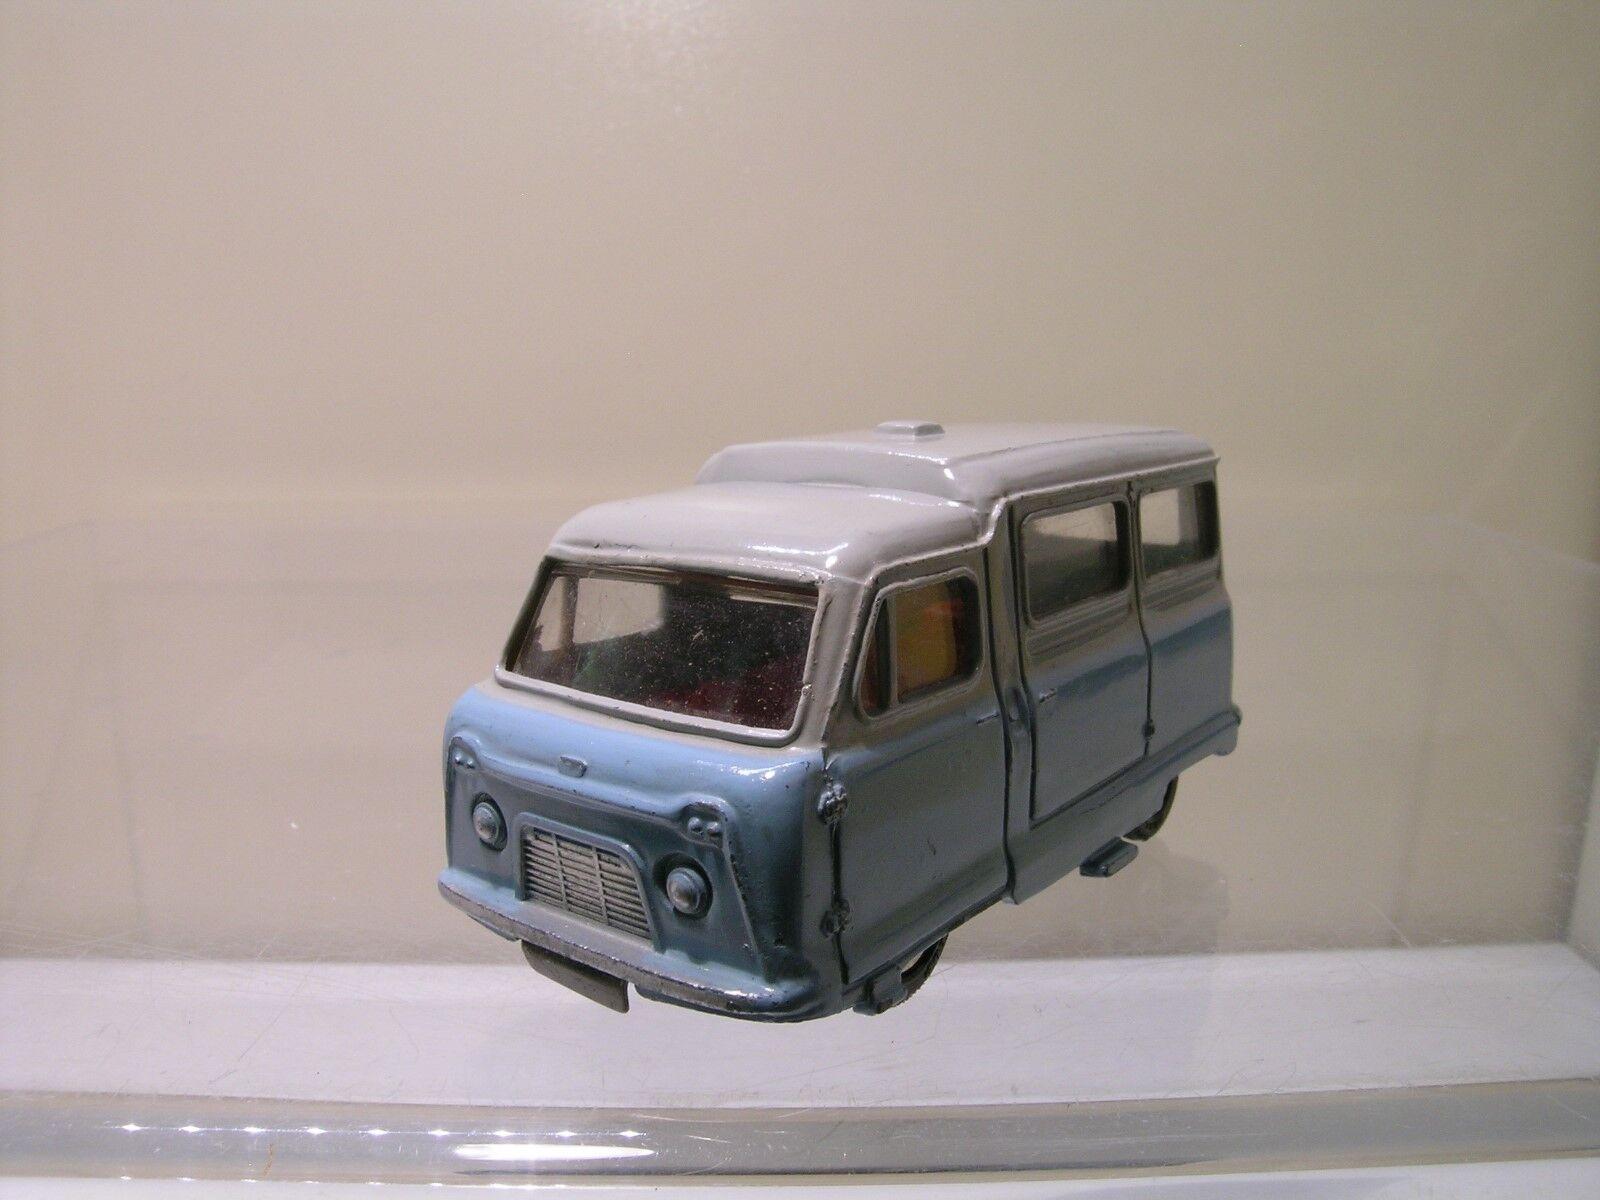 DINKY TOYS UK 295 STANDARD KENEBRAKE KENEX BUS bleu gris  NEAR-MINT SCALE 1 43  édition limitée chaude